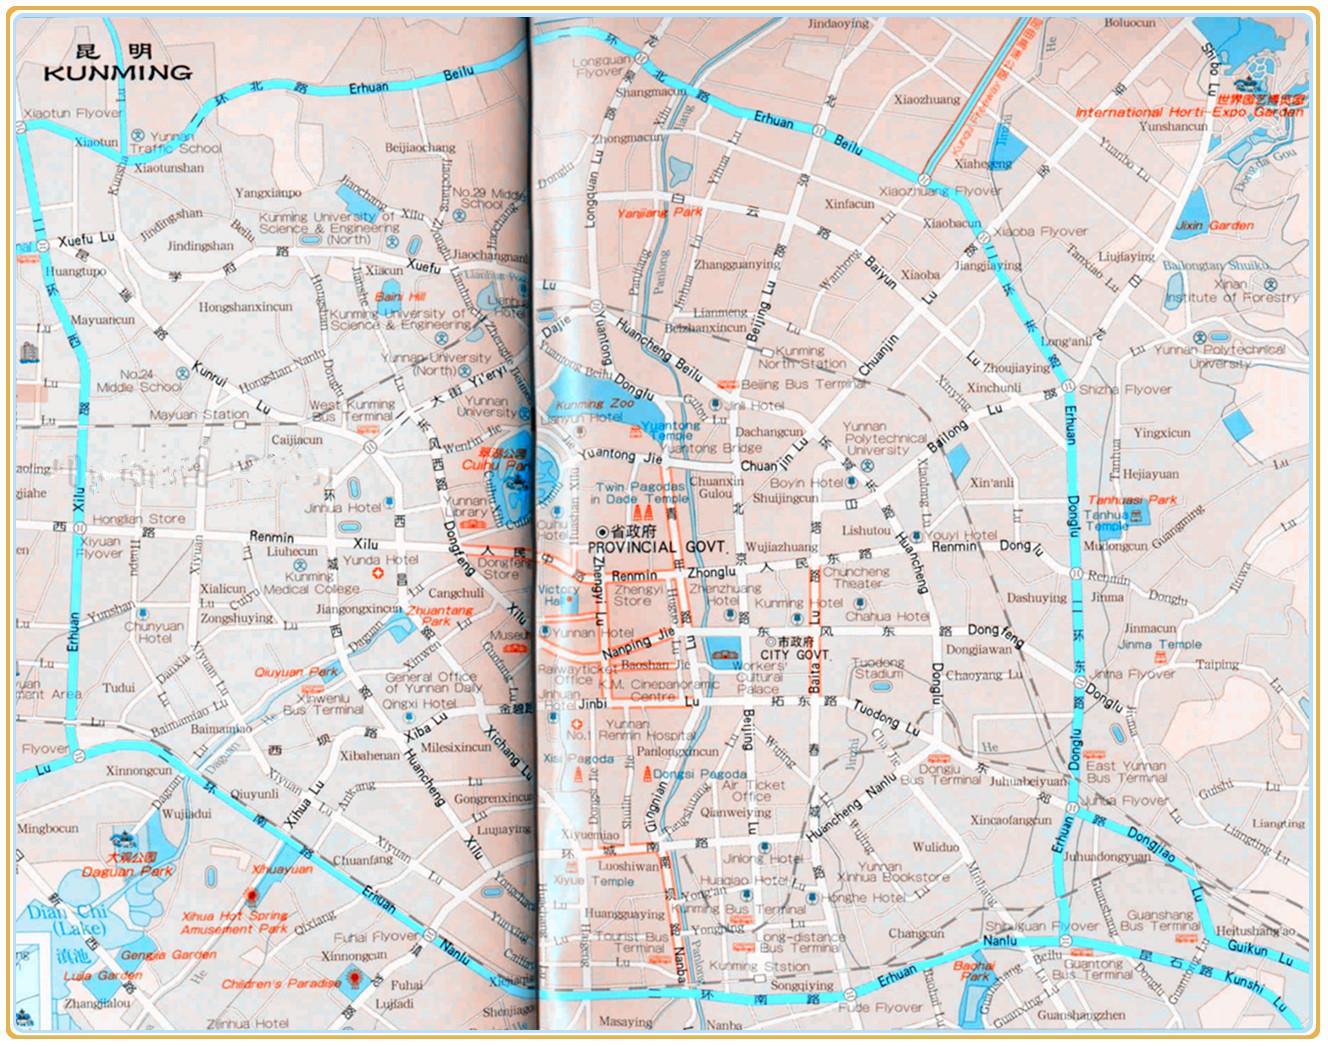 Kunming Bus Map on hefei bus map, changchun bus map, wuhan bus map, haikou bus map, changzhou bus map, bangalore bus map, osaka bus map, ho chi minh city bus map, foshan bus map, nanchang bus map, fukuoka bus map, chongqing bus map, yichang bus map, harbin bus map, shenzhen bus map, ningbo bus map, shenyang bus map, lanzhou bus map, lijiang bus map, ipoh bus map,